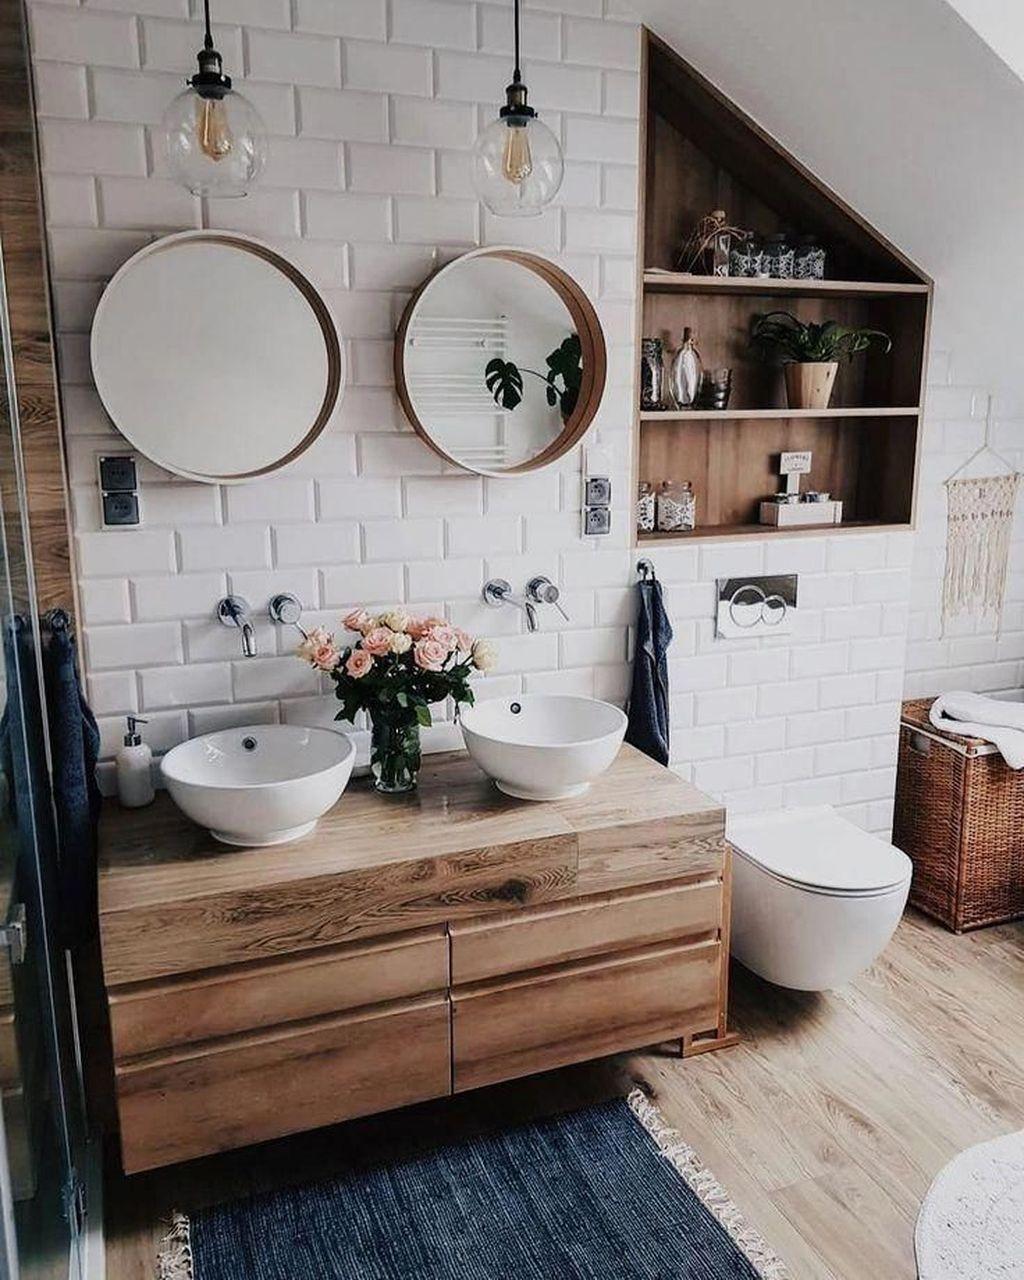 Fascinating Rustic Bathroom Decor Ideas You Must Copy 05